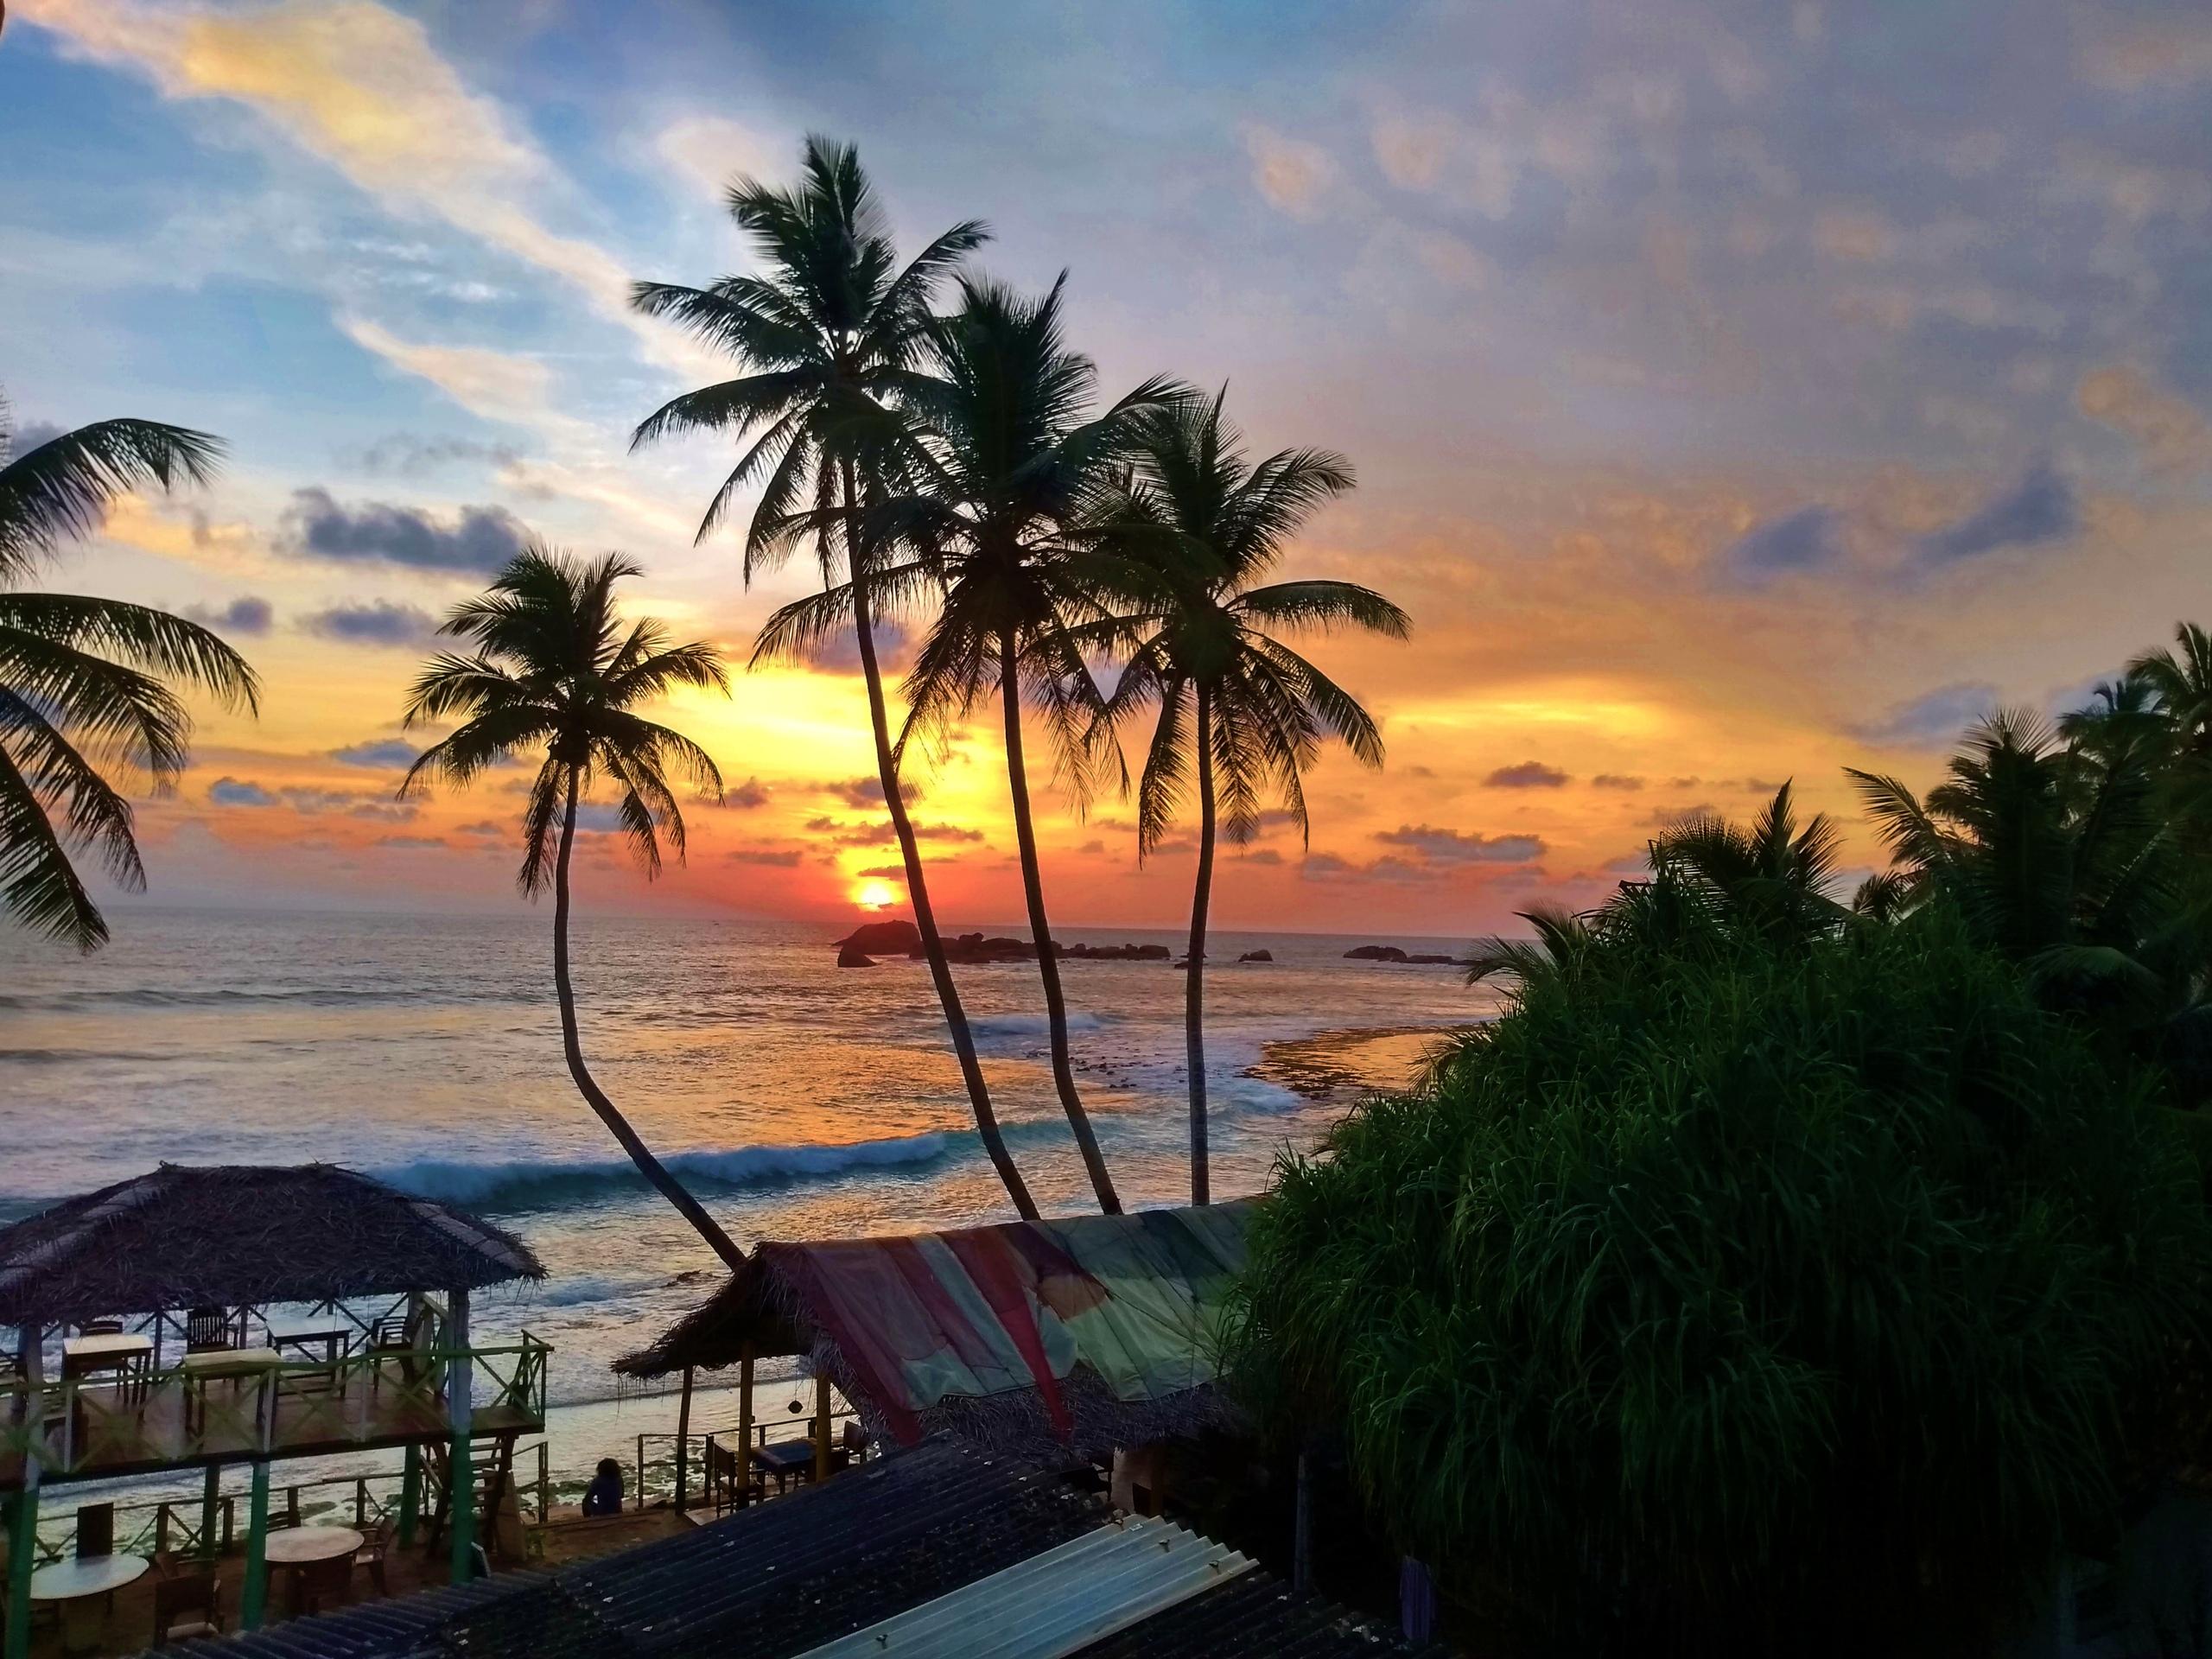 Шри Ланка (фото) - Страница 9 5R_EZjYxK1Q